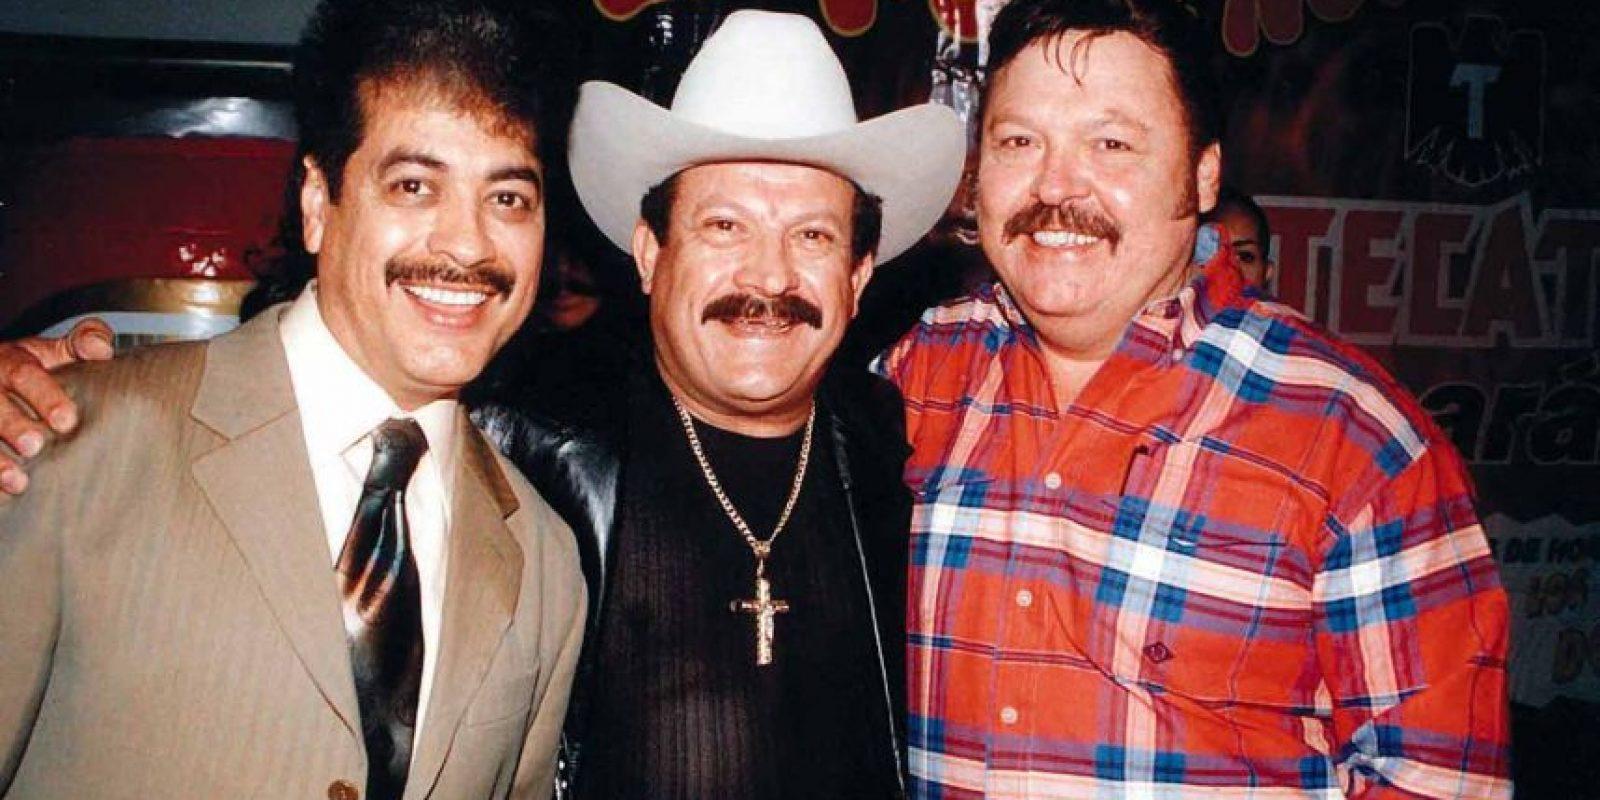 Don Lupe Tijerina falleció la madrugada del 5 de julio a causa de un infarto Foto:Cuartoscuro